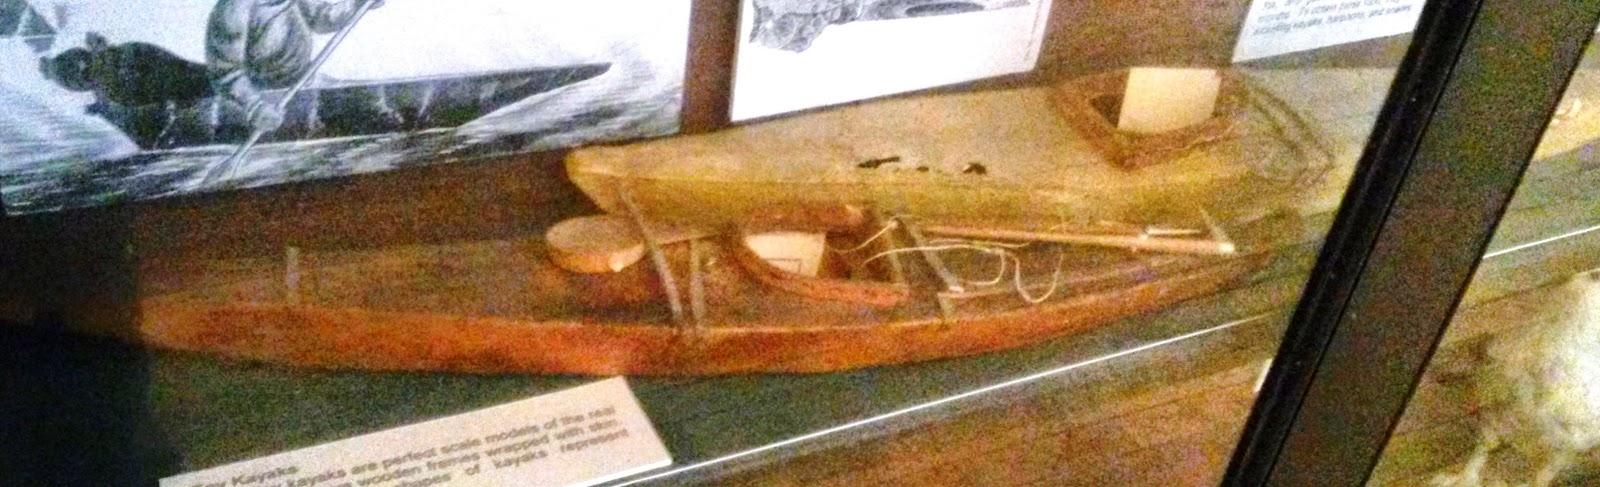 Greenland Inuit kayak models